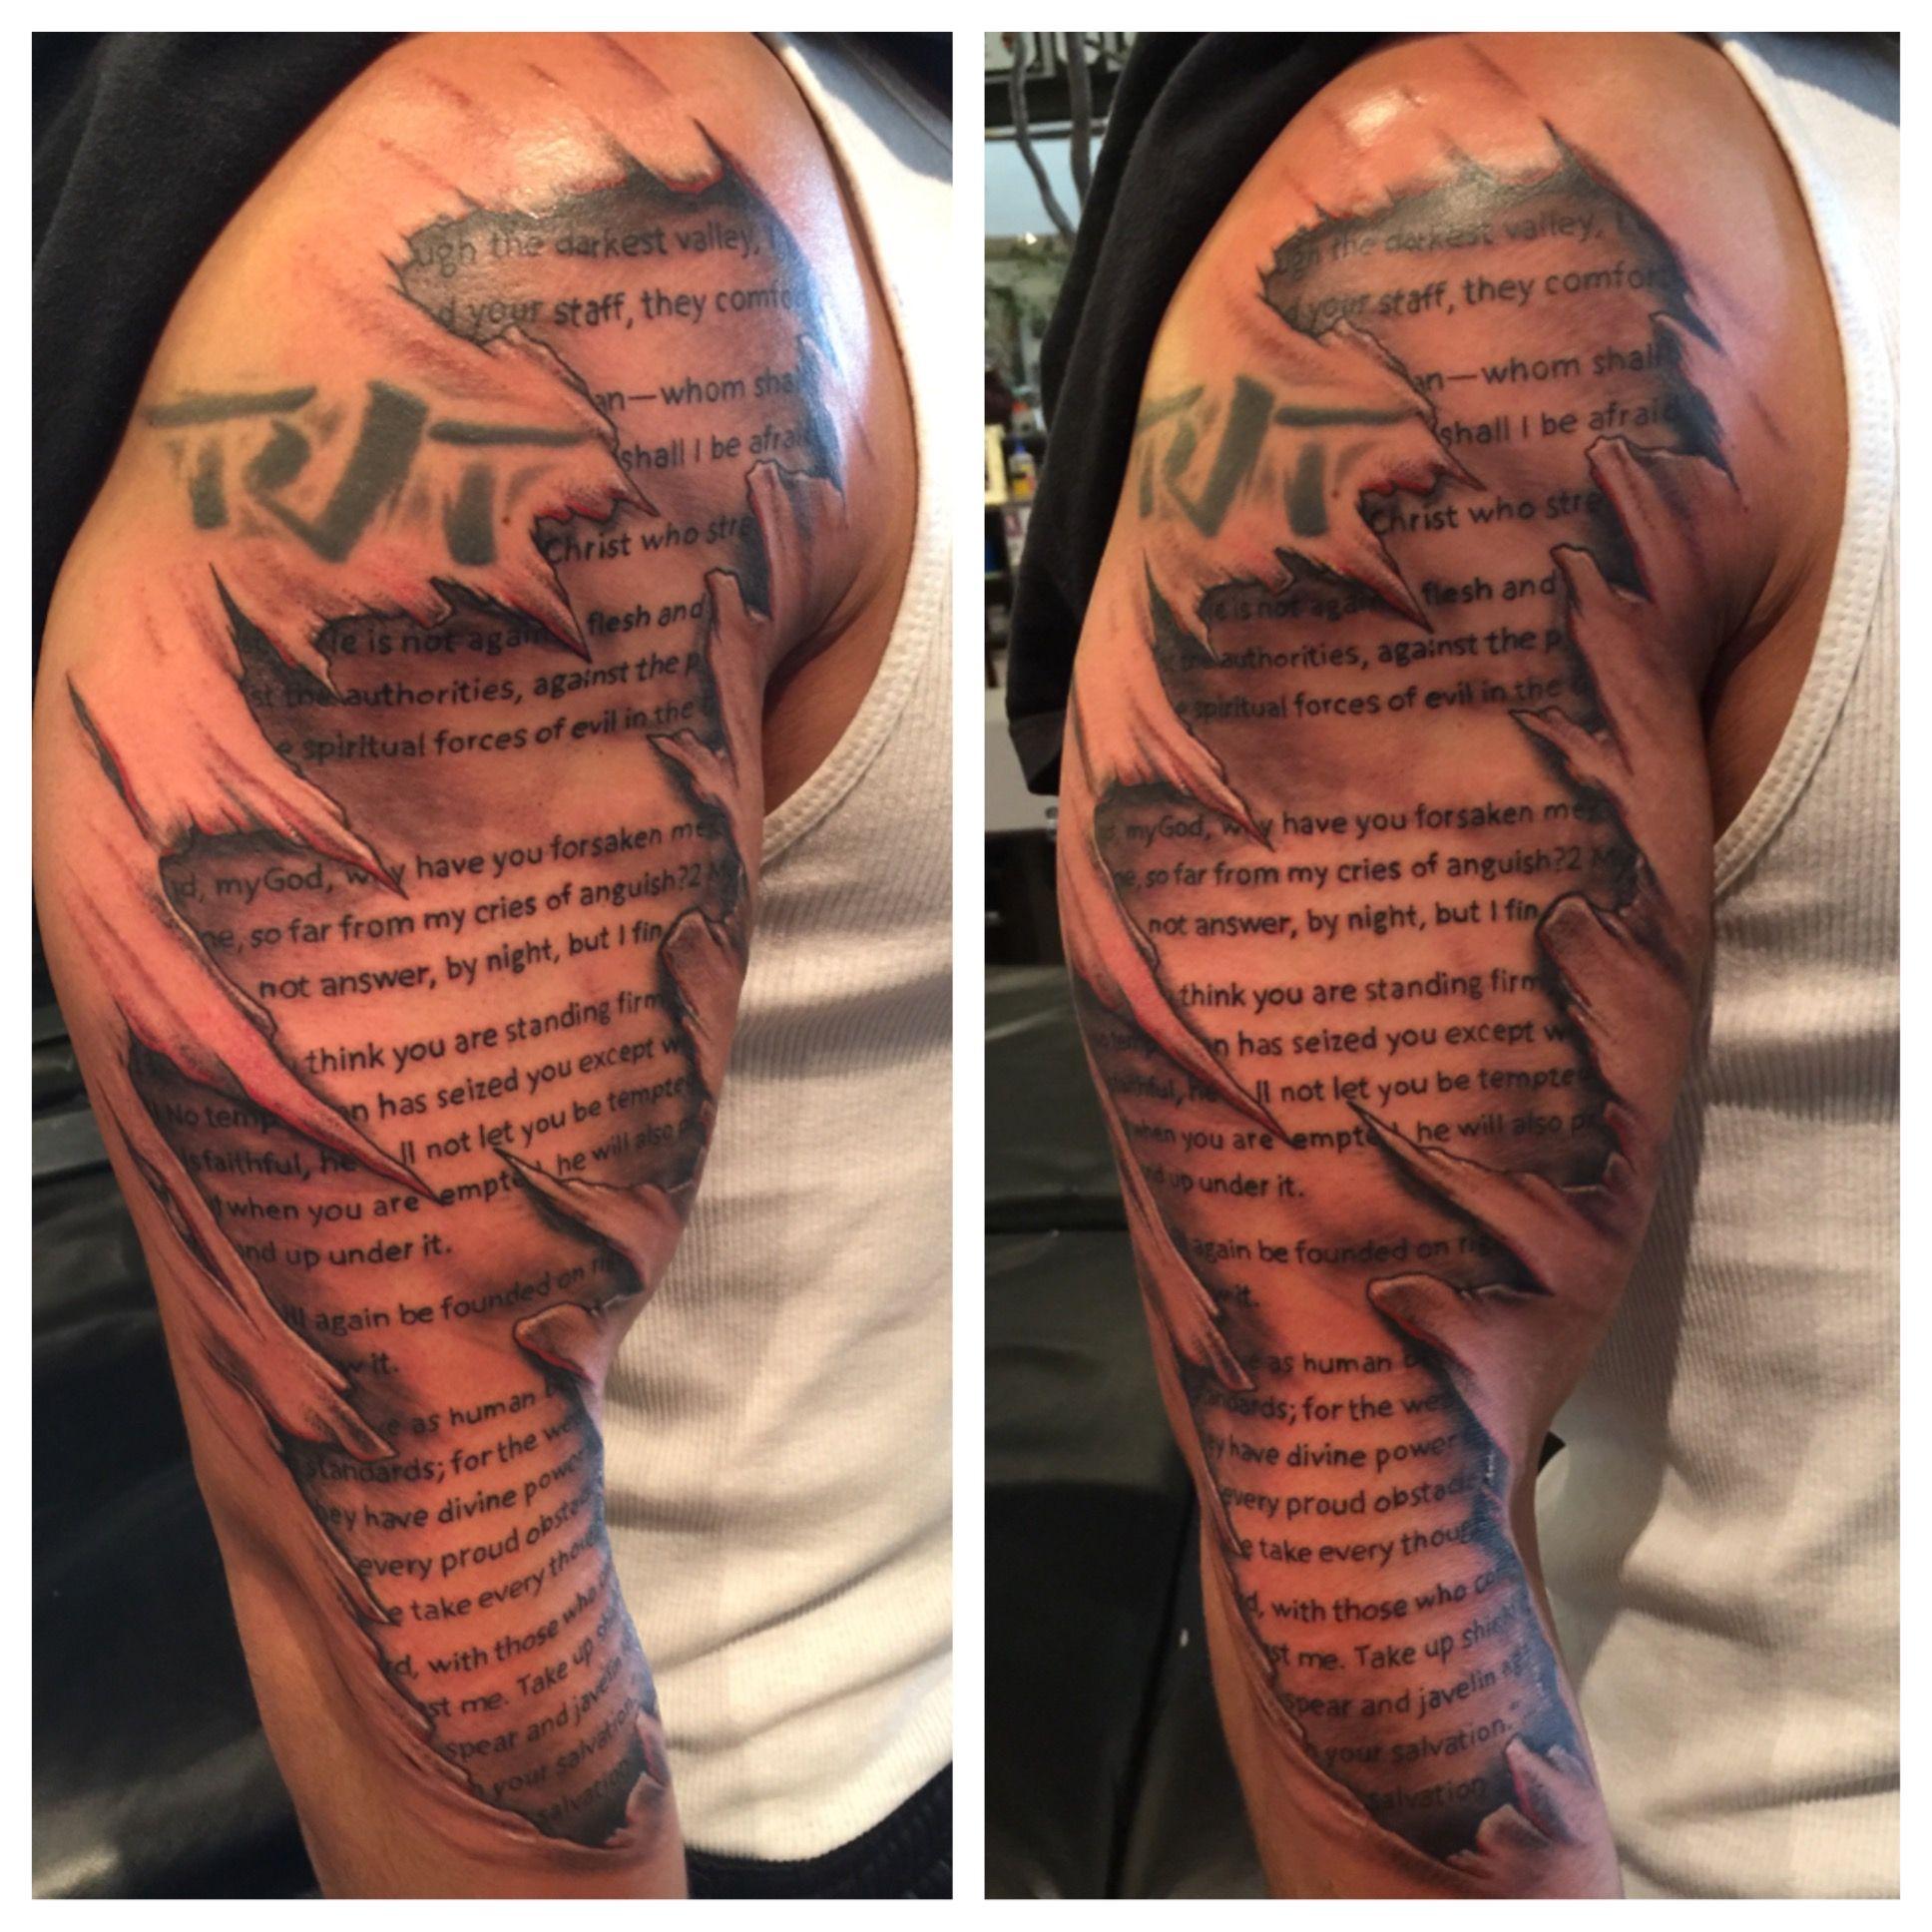 Skin Rip, Tattoo, Bible Verse, Lettering, Under Skin